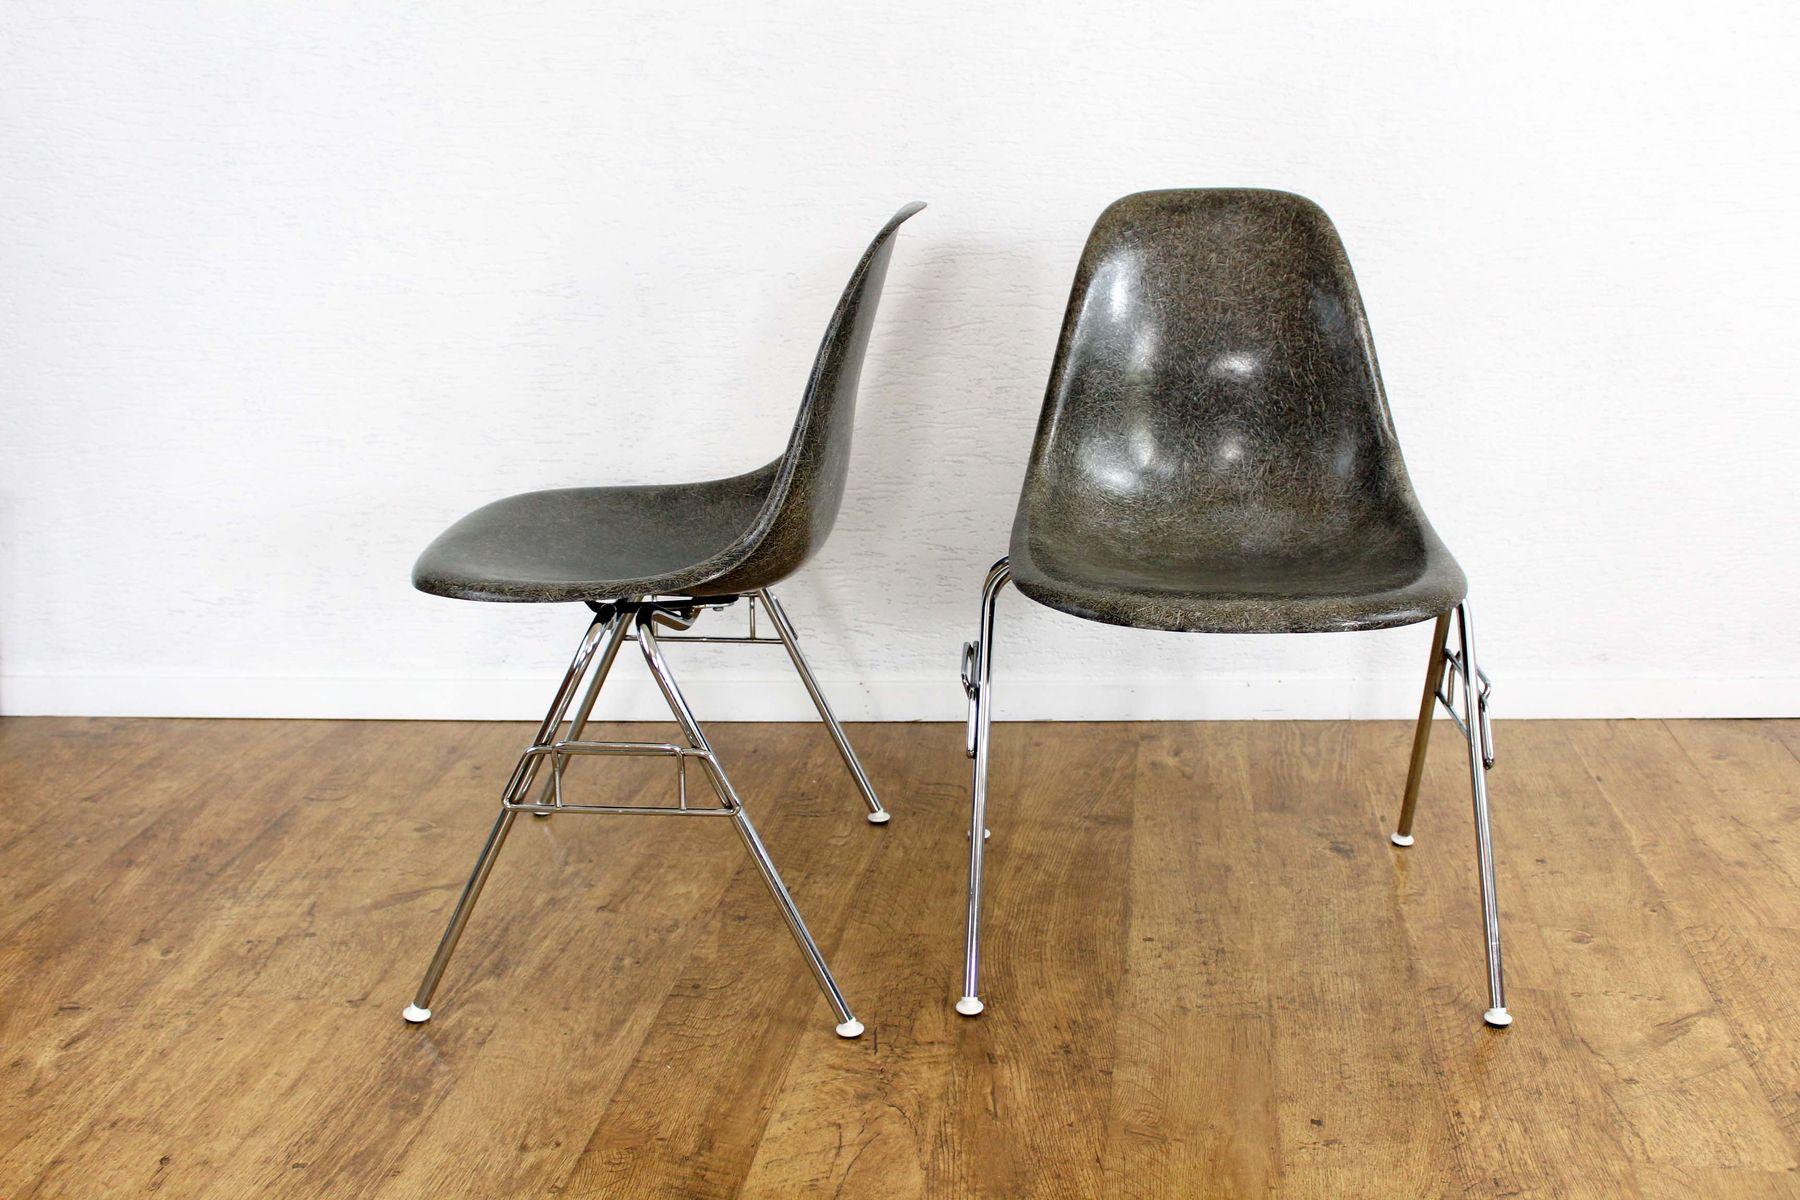 mid century modell dss stuhl von charles ray eames f r herman miller bei pamono kaufen. Black Bedroom Furniture Sets. Home Design Ideas